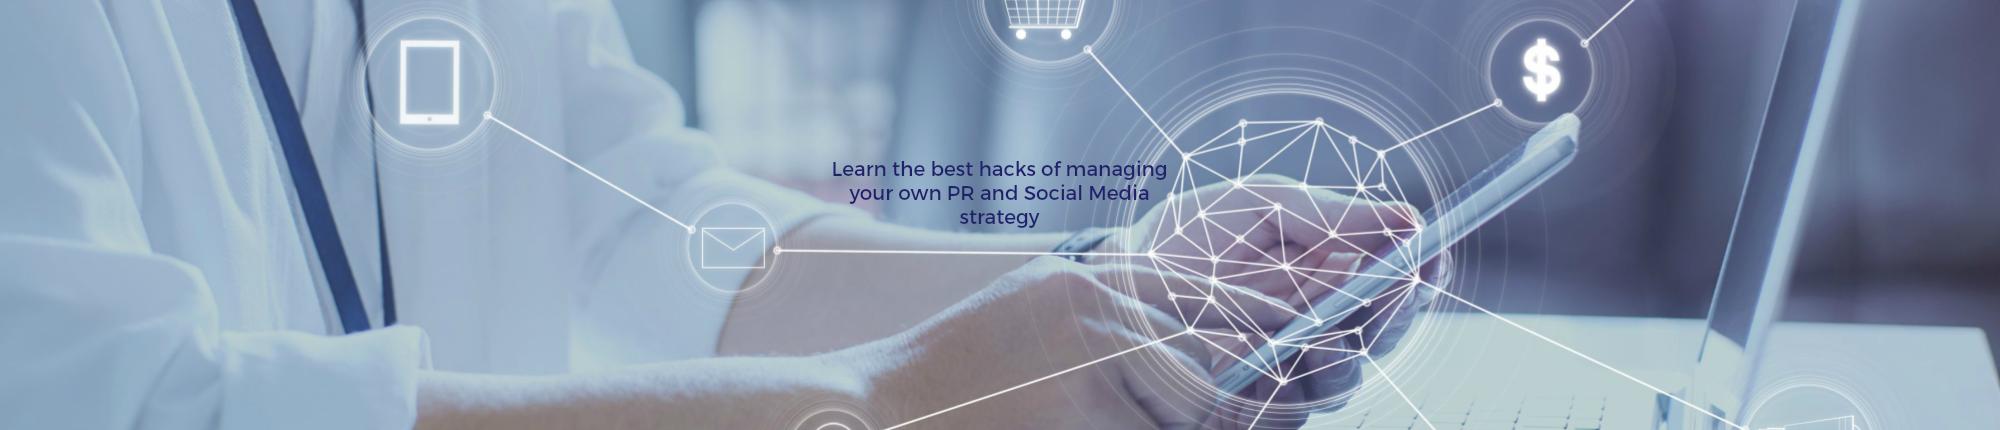 The Hacks of PR and Social Media